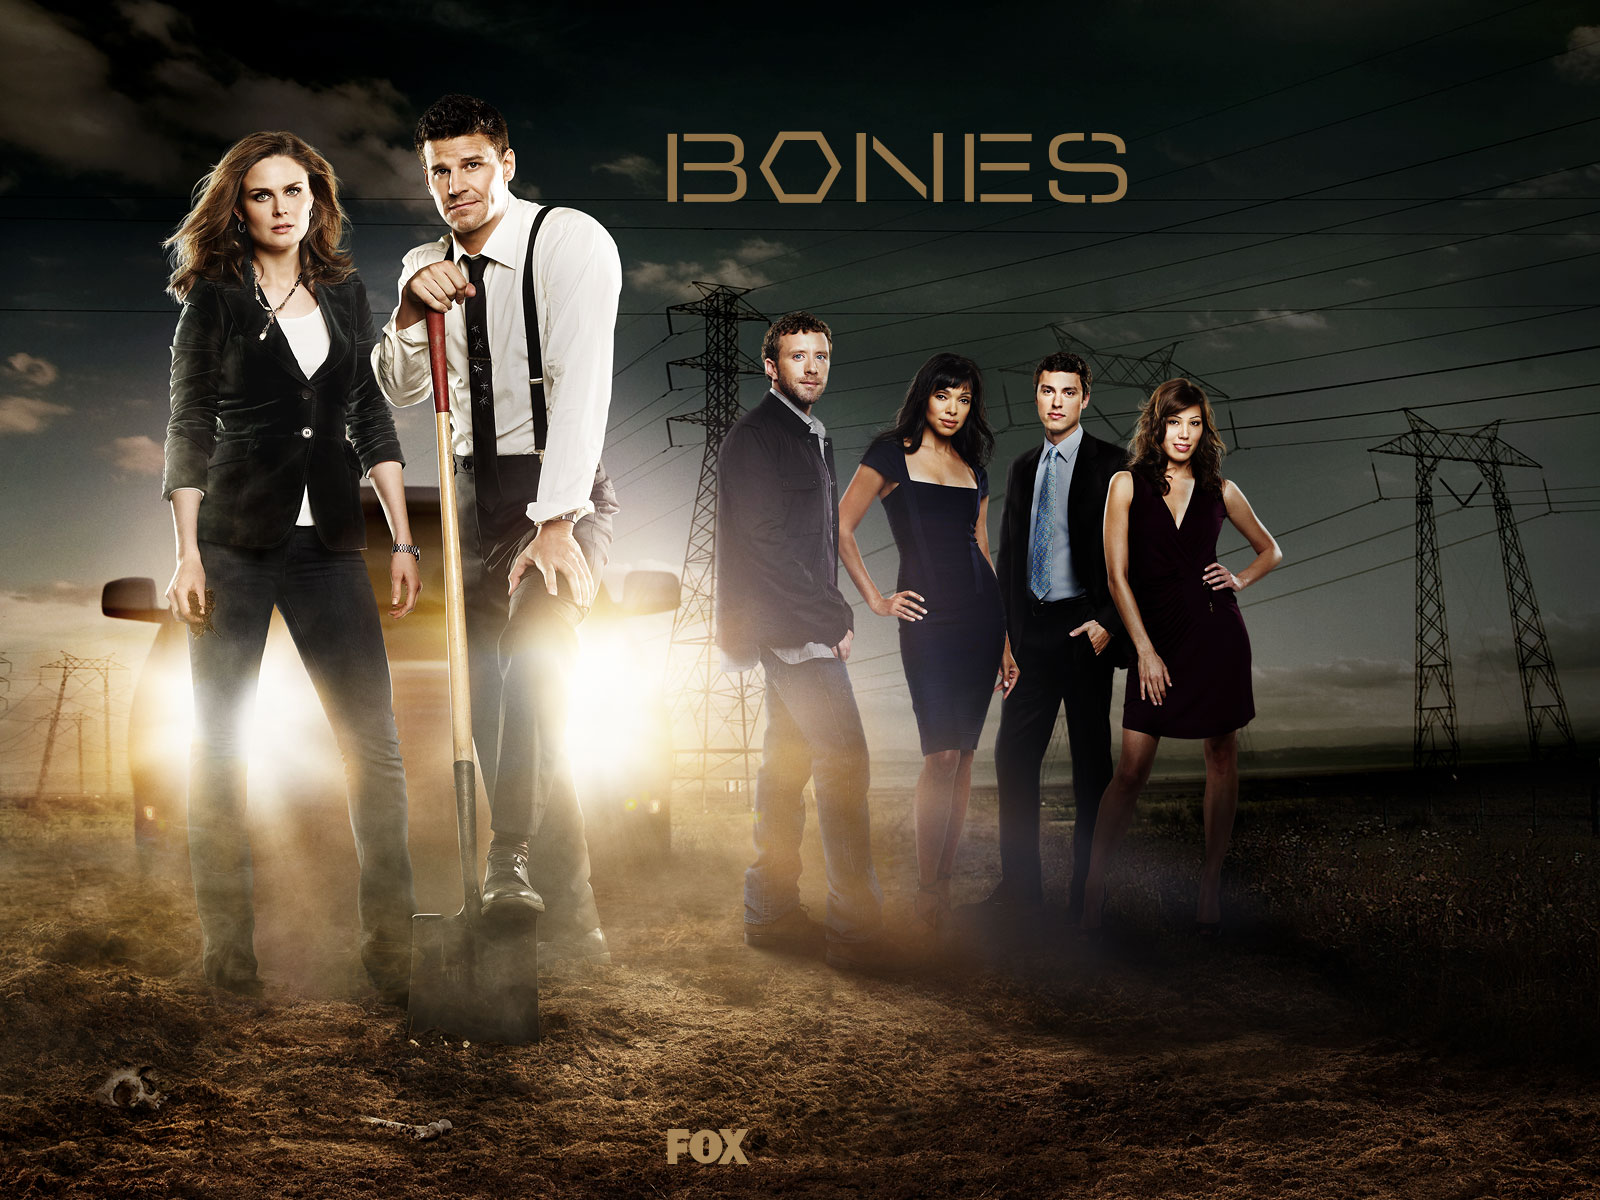 http://1.bp.blogspot.com/_2U3U6AwE-ZQ/TJiEV8Az0mI/AAAAAAAAAYg/xGmztzTmYsg/s1600/bones-001%28www.TheWallpapers.org%29.jpg